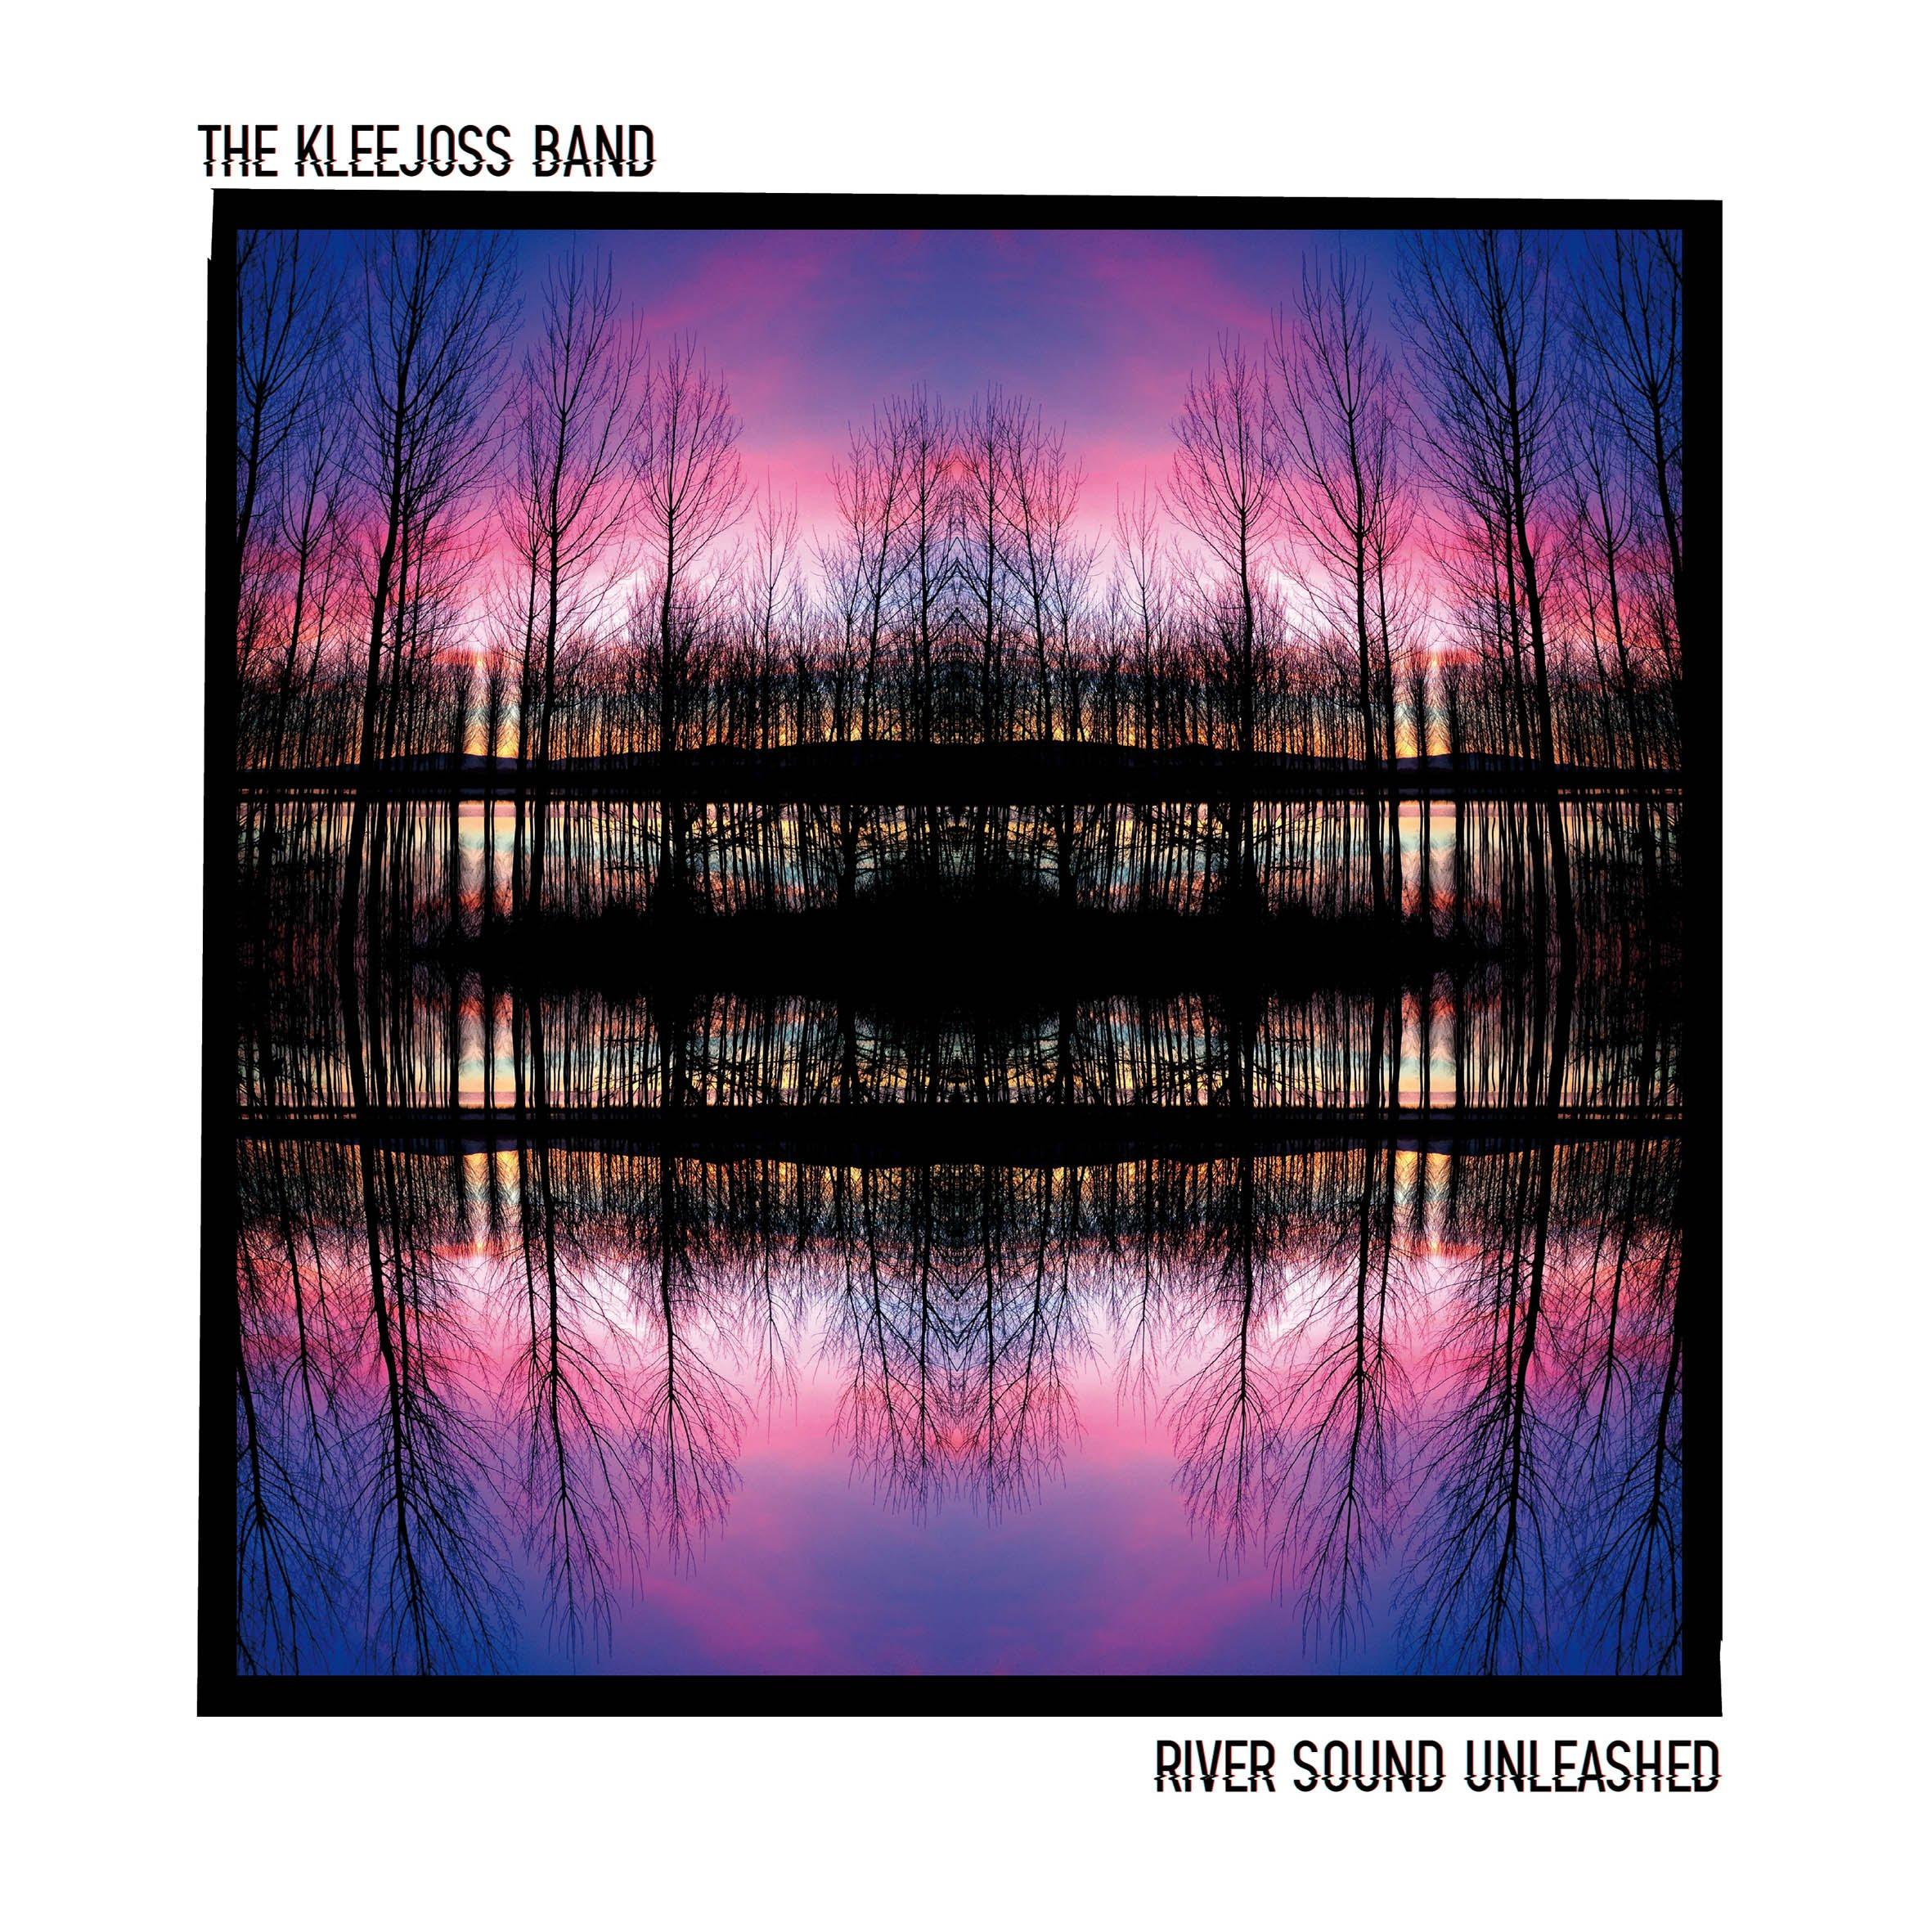 kleejoss_band-river_sound_unleashed